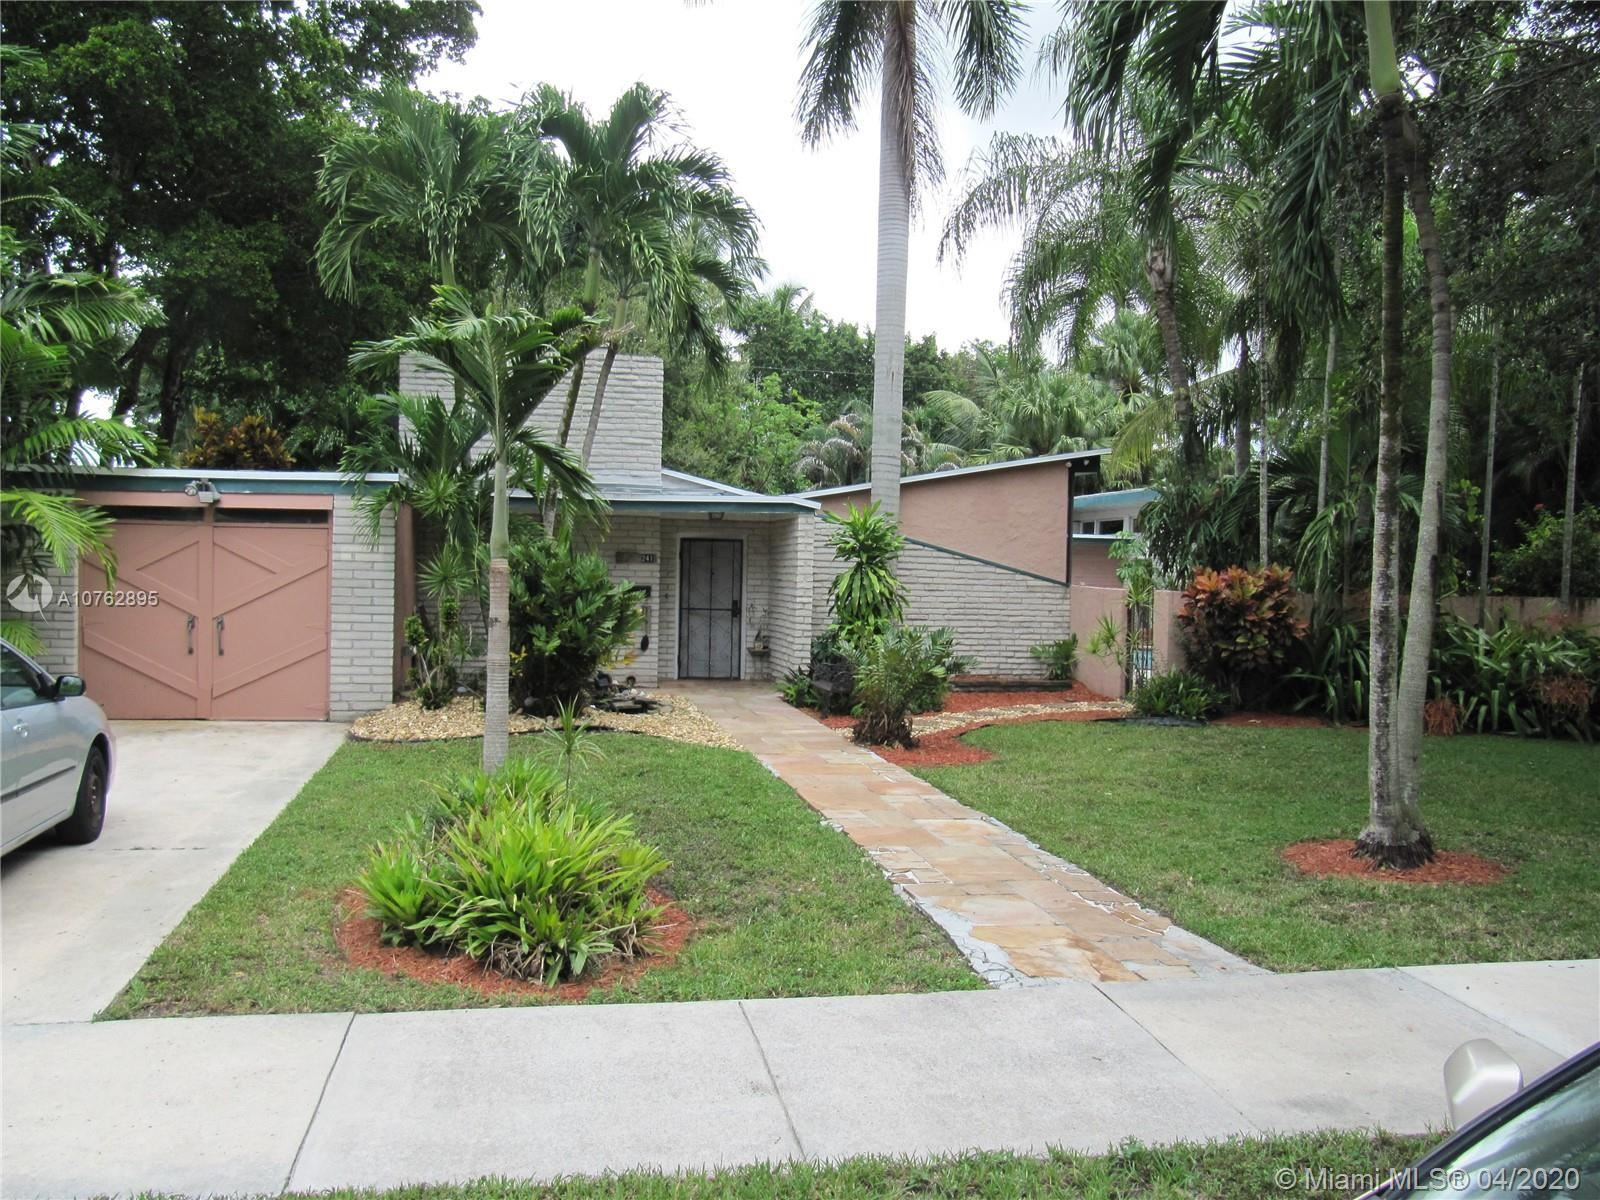 241 De Leon Dr, Miami Springs, FL 33166 - MLS#: A10762895